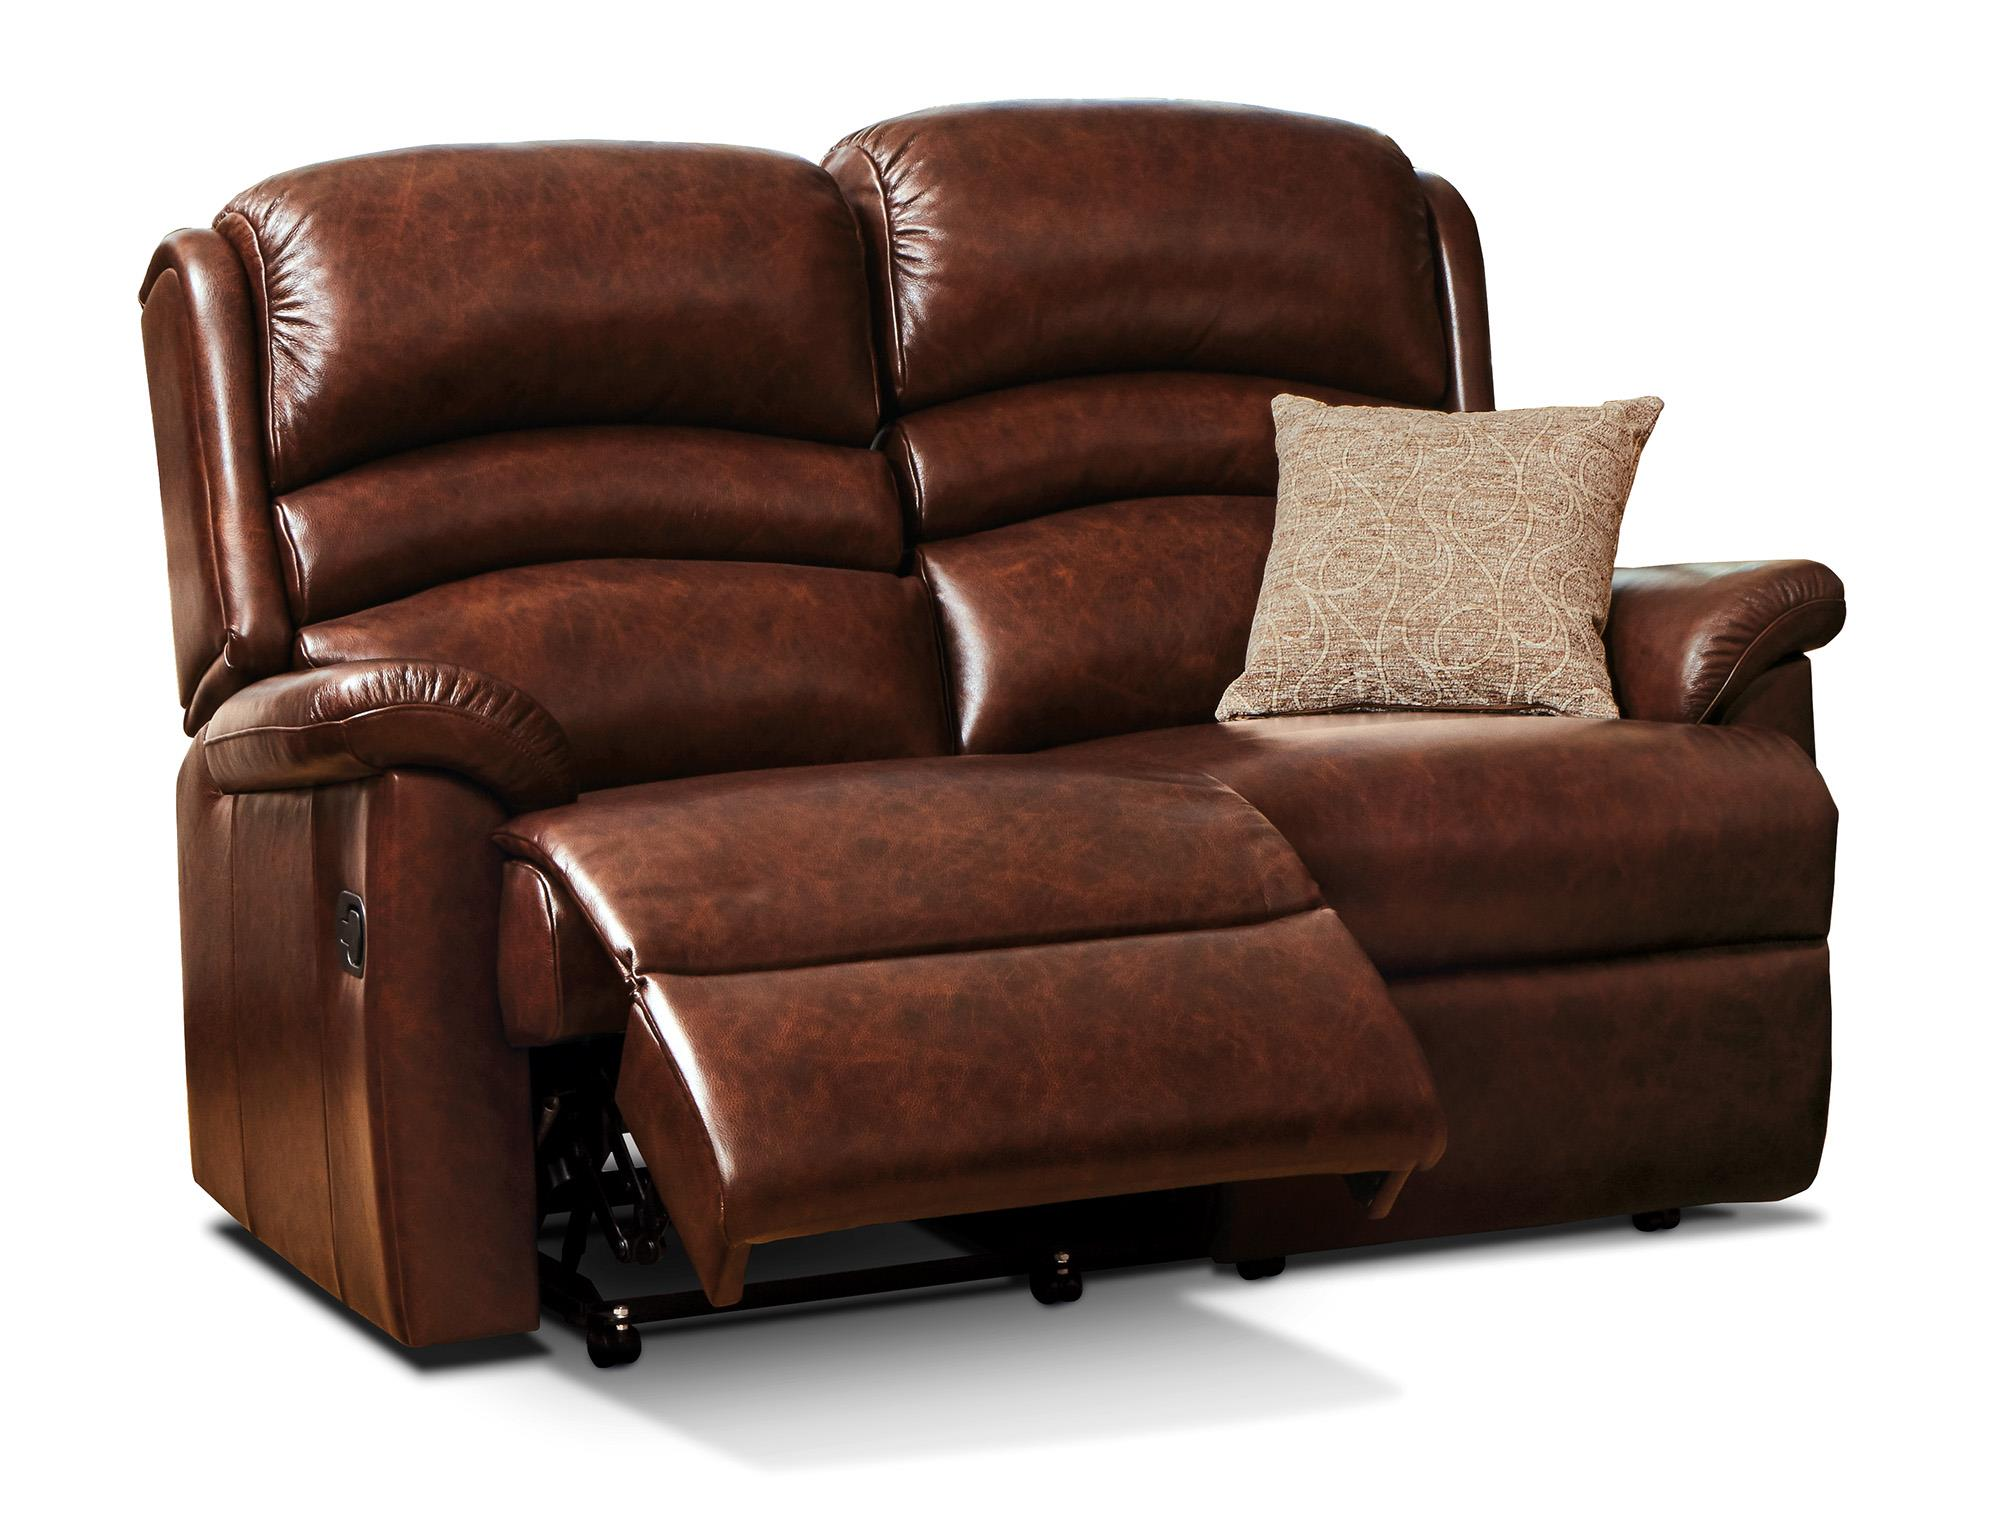 OLIVIA - Leather Reclining 2 Seat Settee